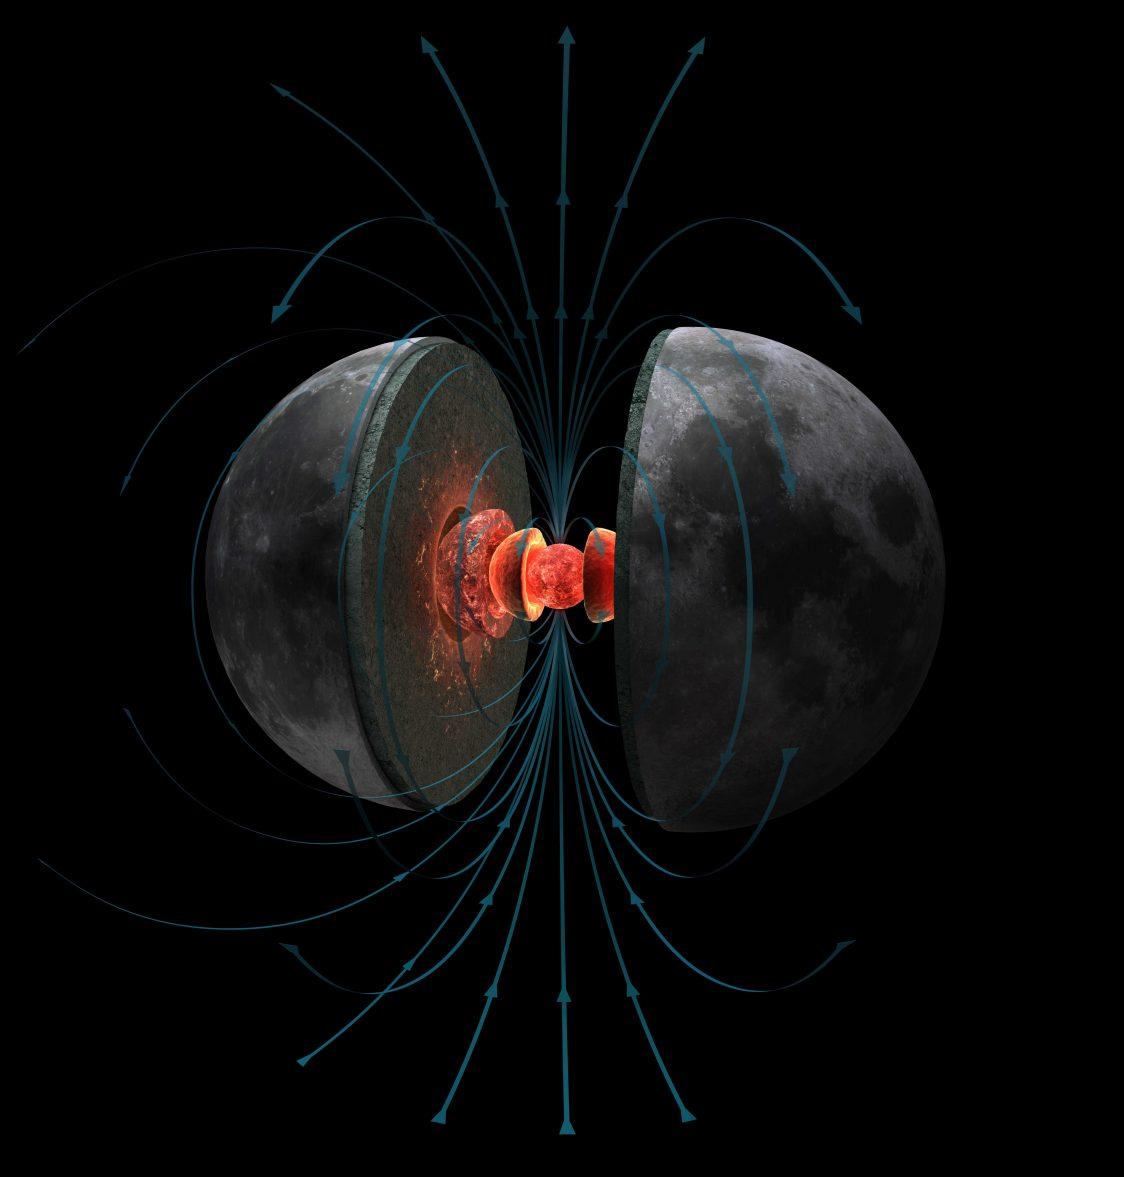 Illustration of the Moon's magnetic field. Image credit: Hernan Canellas / MIT Paleomagnetism Laboratory.